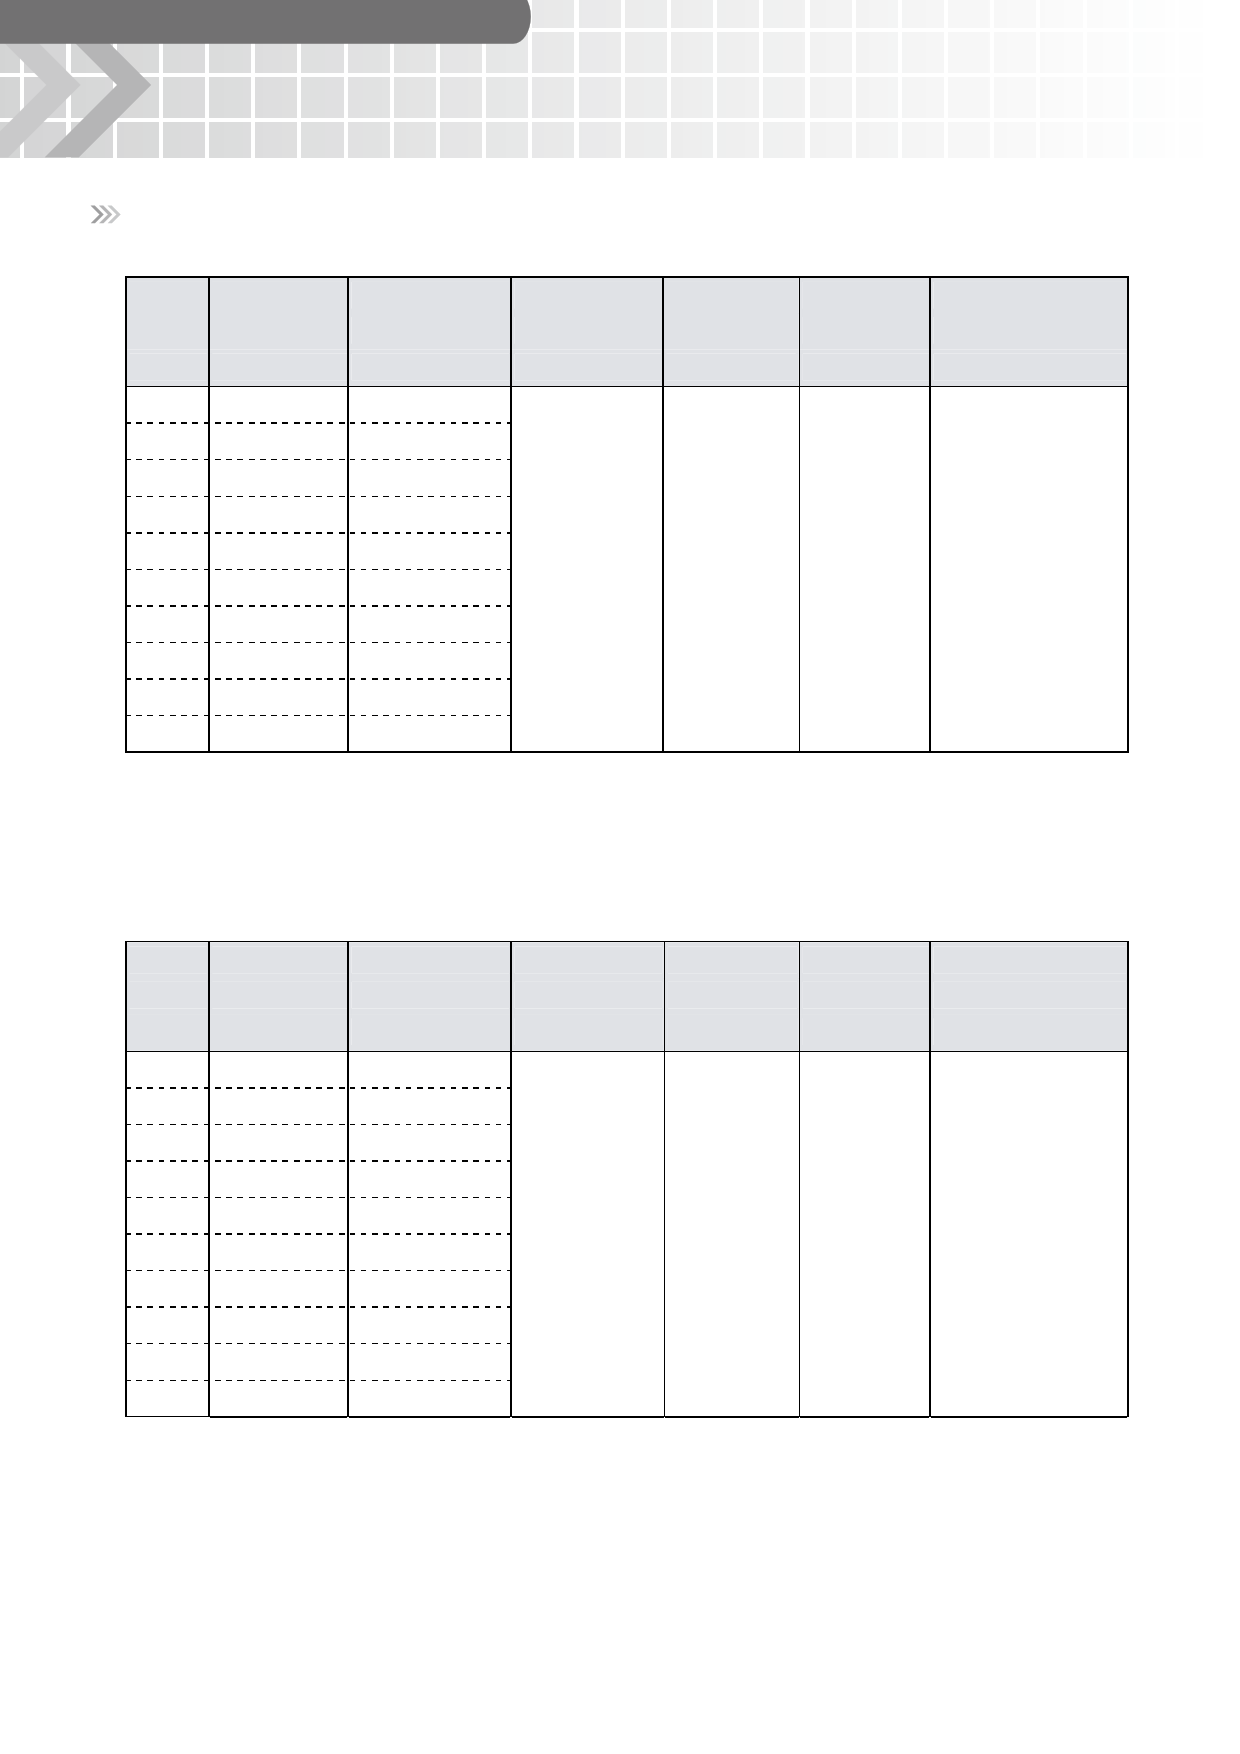 894-2AC2-F-V pdf, ピン配列